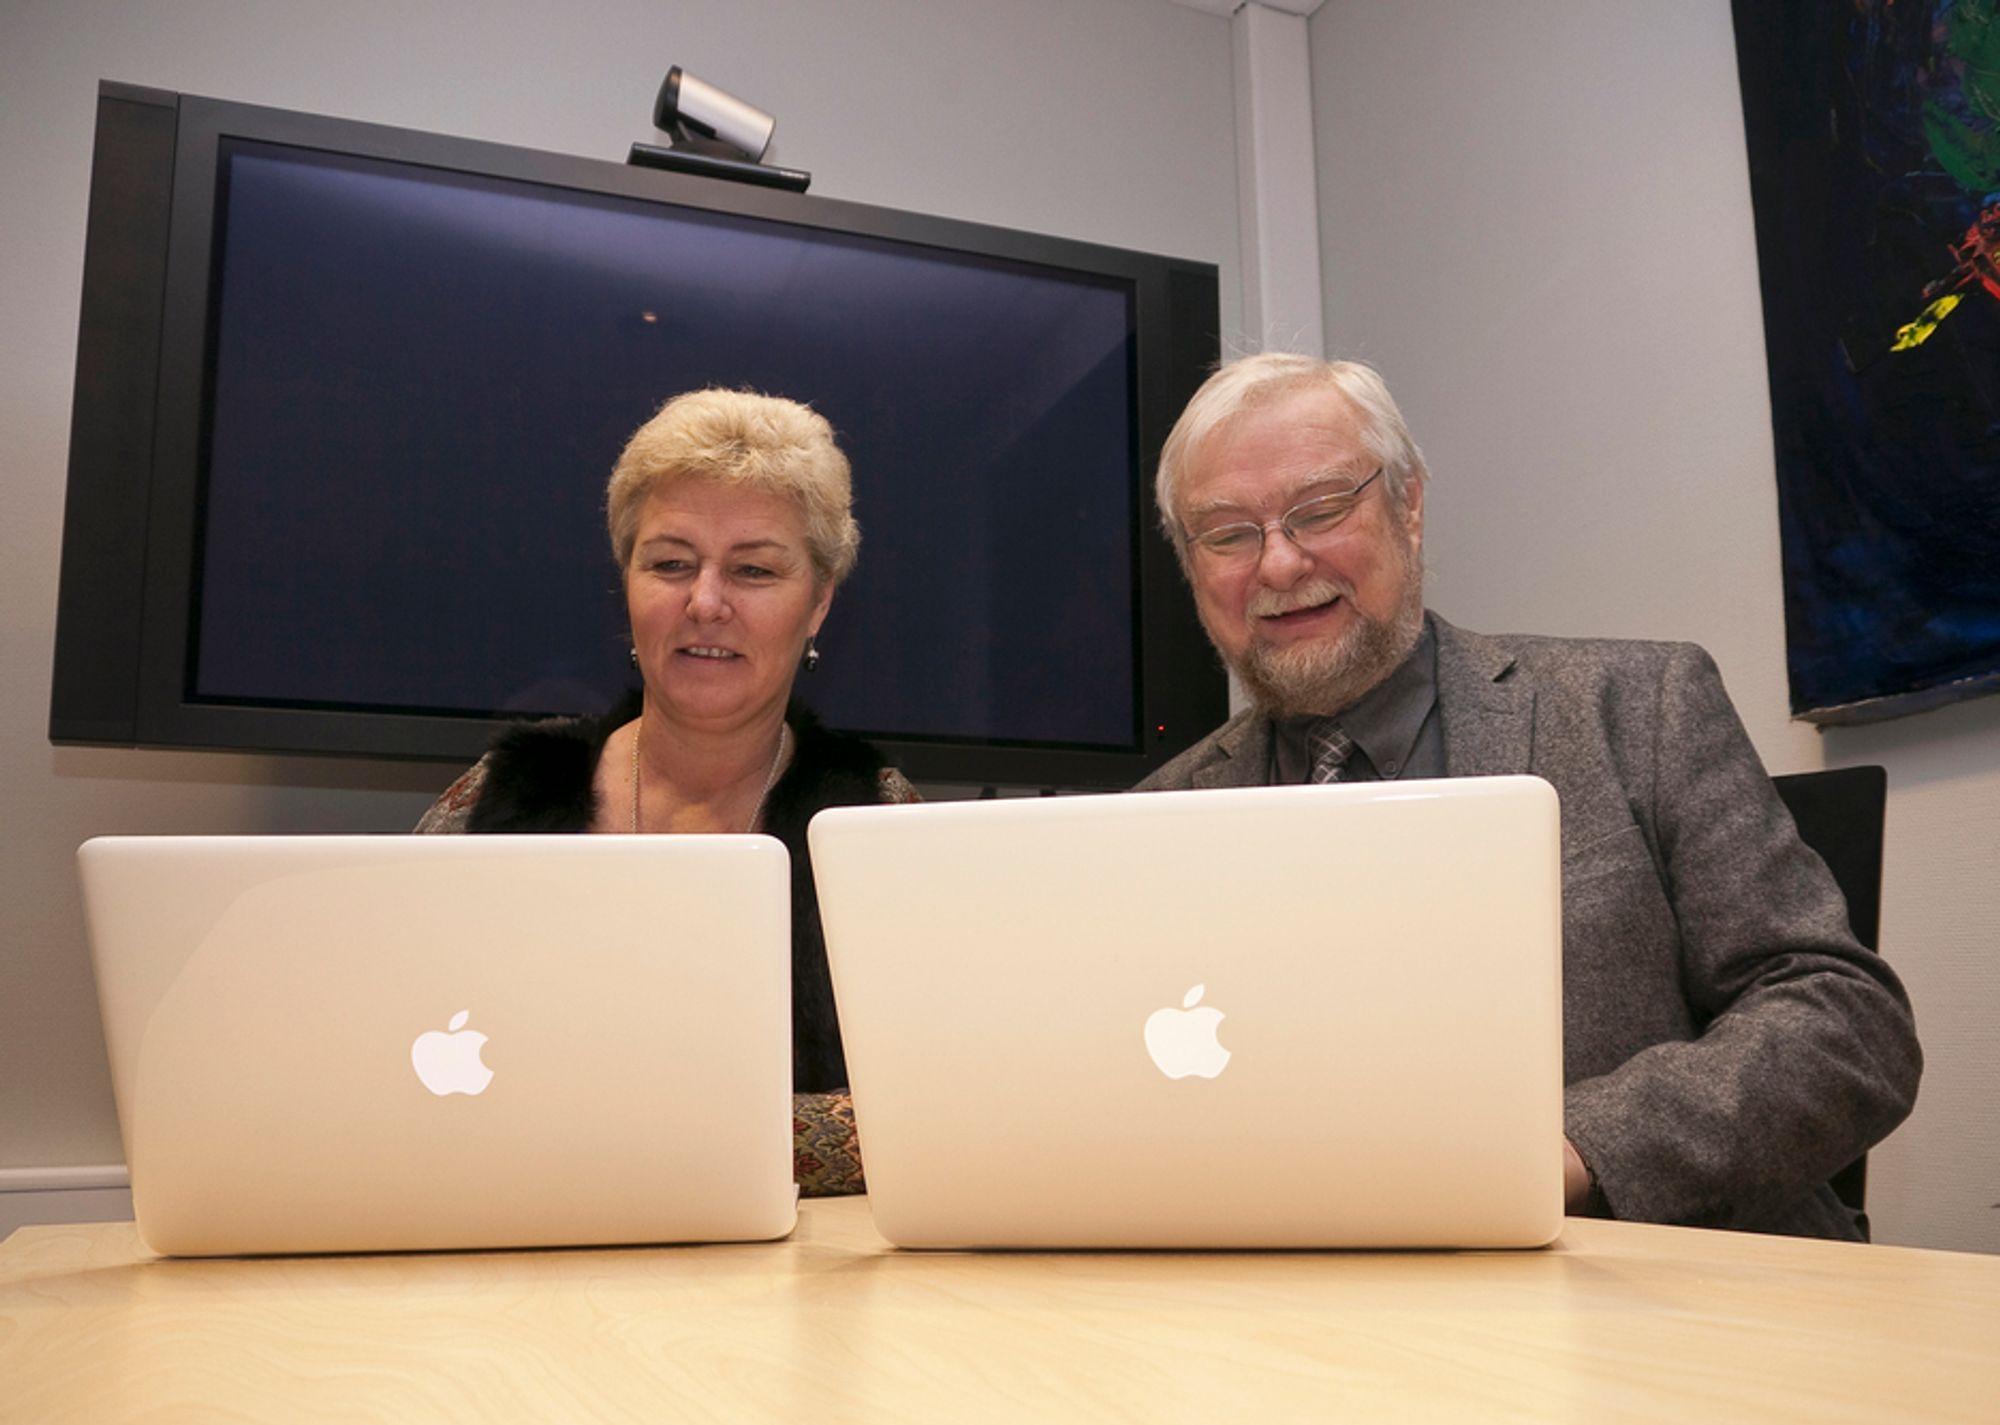 BYTTER:Daglig leder og markedsansvarlig, Hilde Dramdal og rektor Per Storheim ved Akademiet Privatist Drammen er godt fornøyd med byttet til Mac